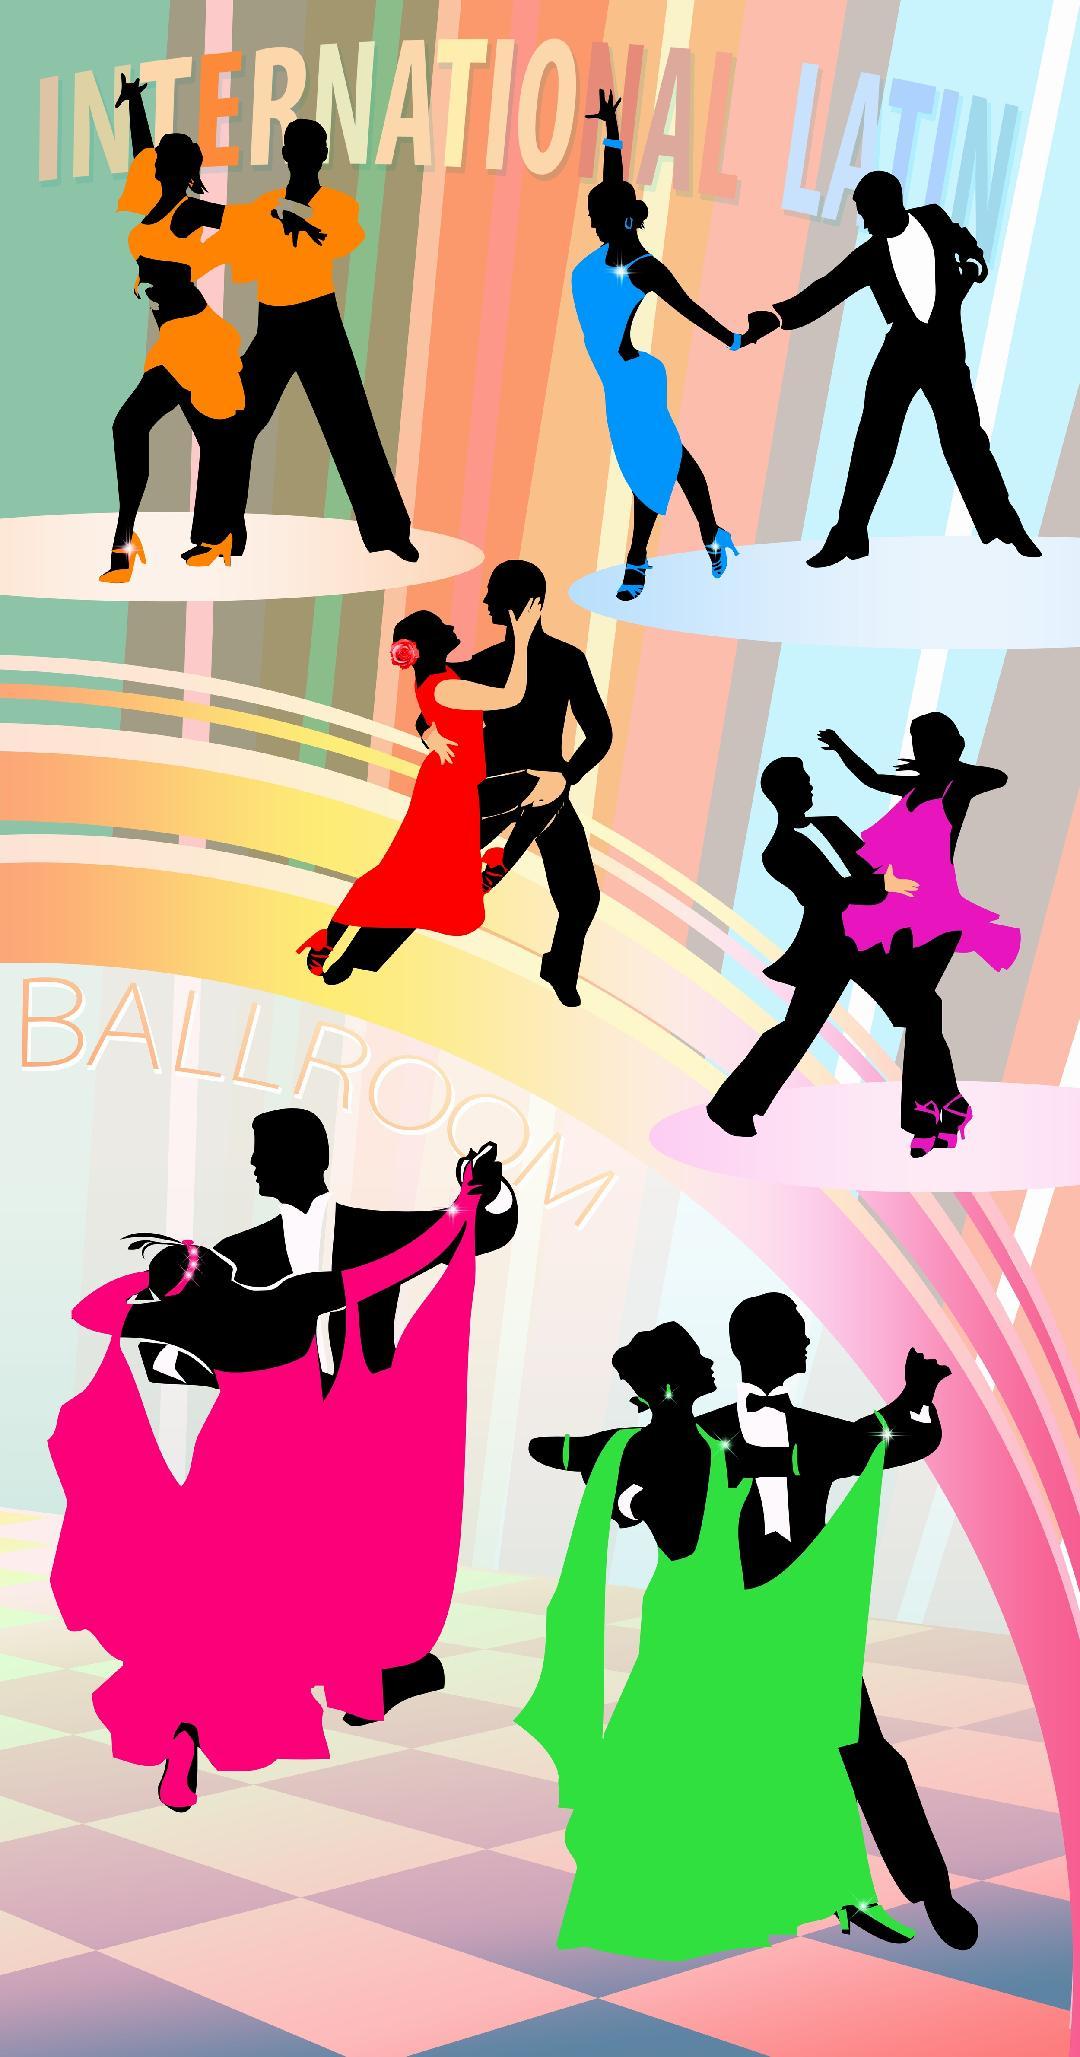 LATIN BALLROOM DANCE - TUESDAYS & THURSDAYSAGE: 4 & UP 6:15PM - 7:15PM